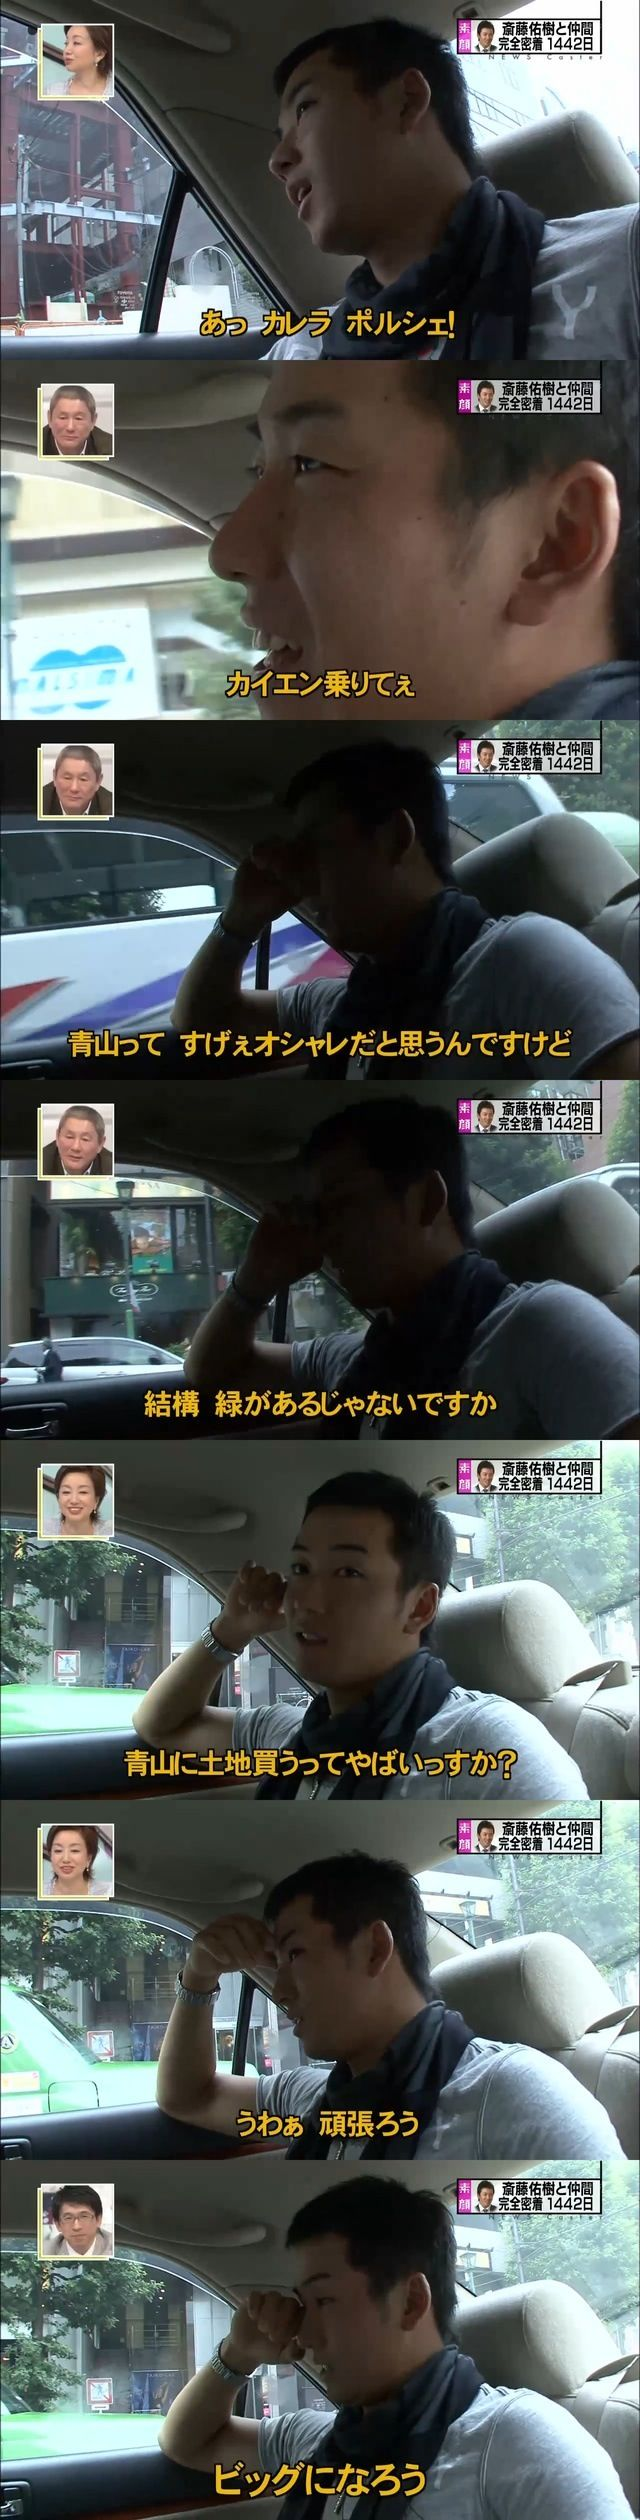 http://livedoor.blogimg.jp/saito234-affili4/imgs/7/6/76399c09.jpg